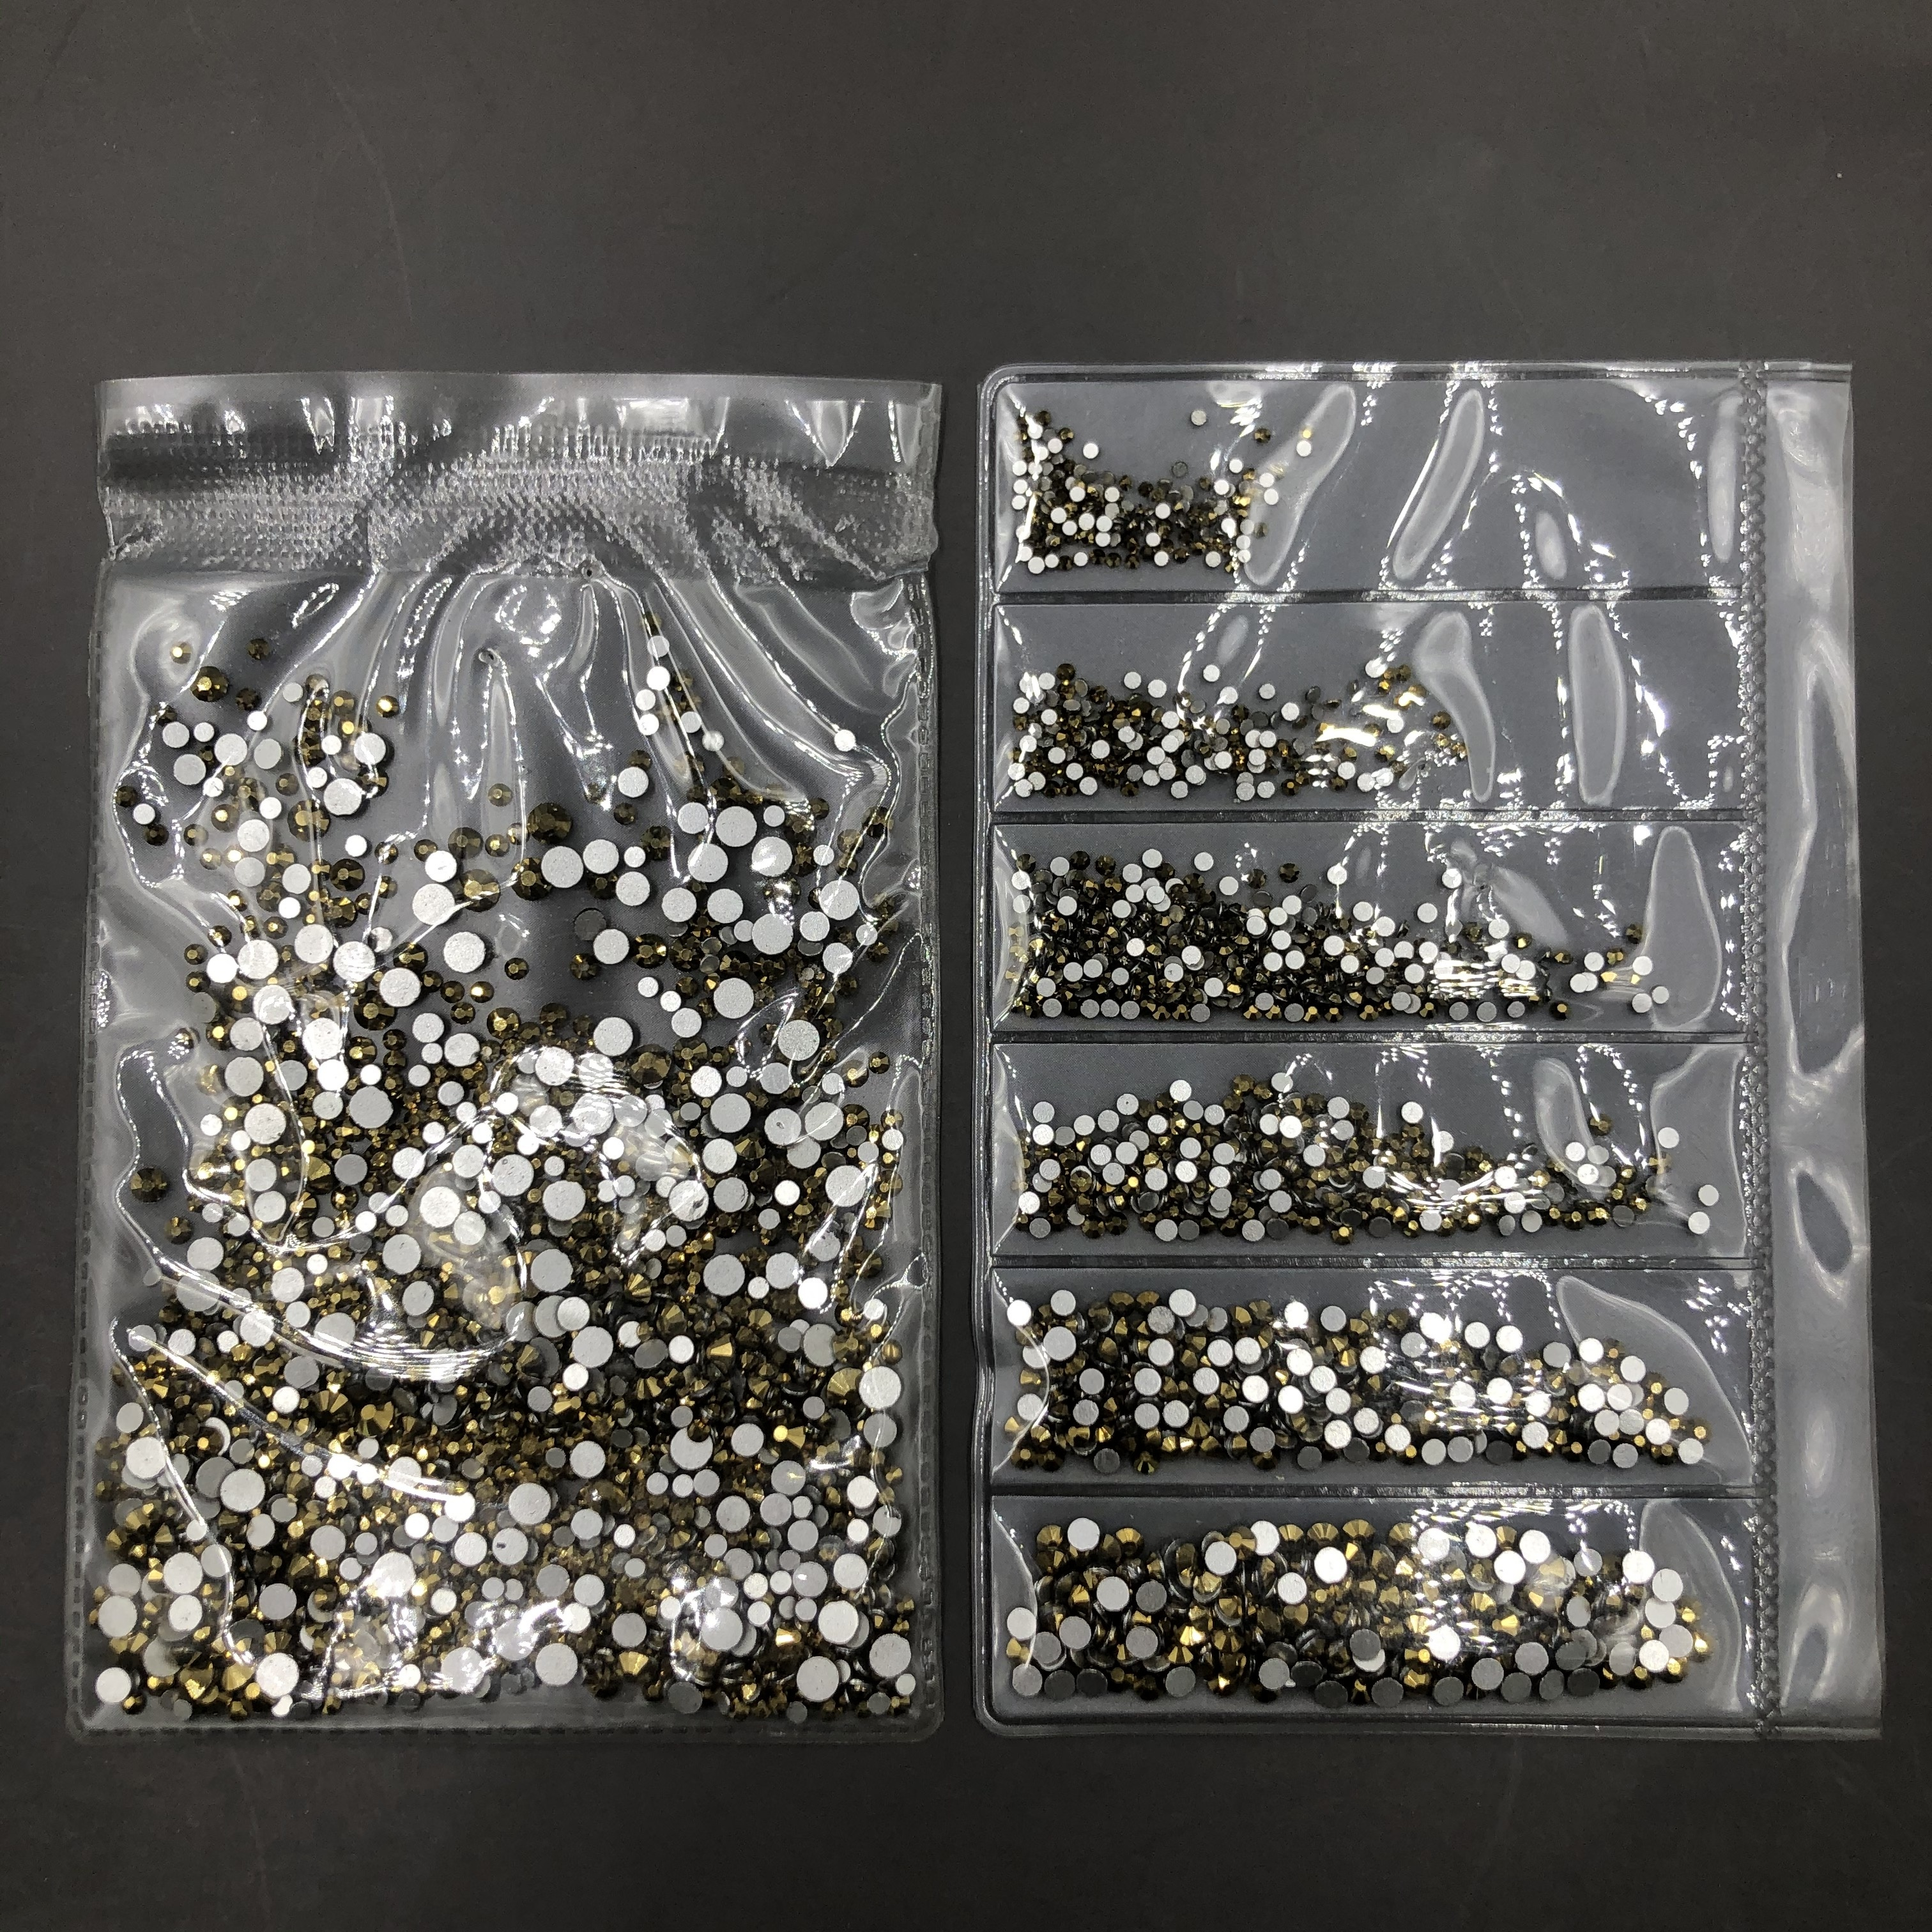 C&Y Gold Ore Non Hotfix Flatback Mix Size 6 Blank Design Rhinestone Crystal For Nails